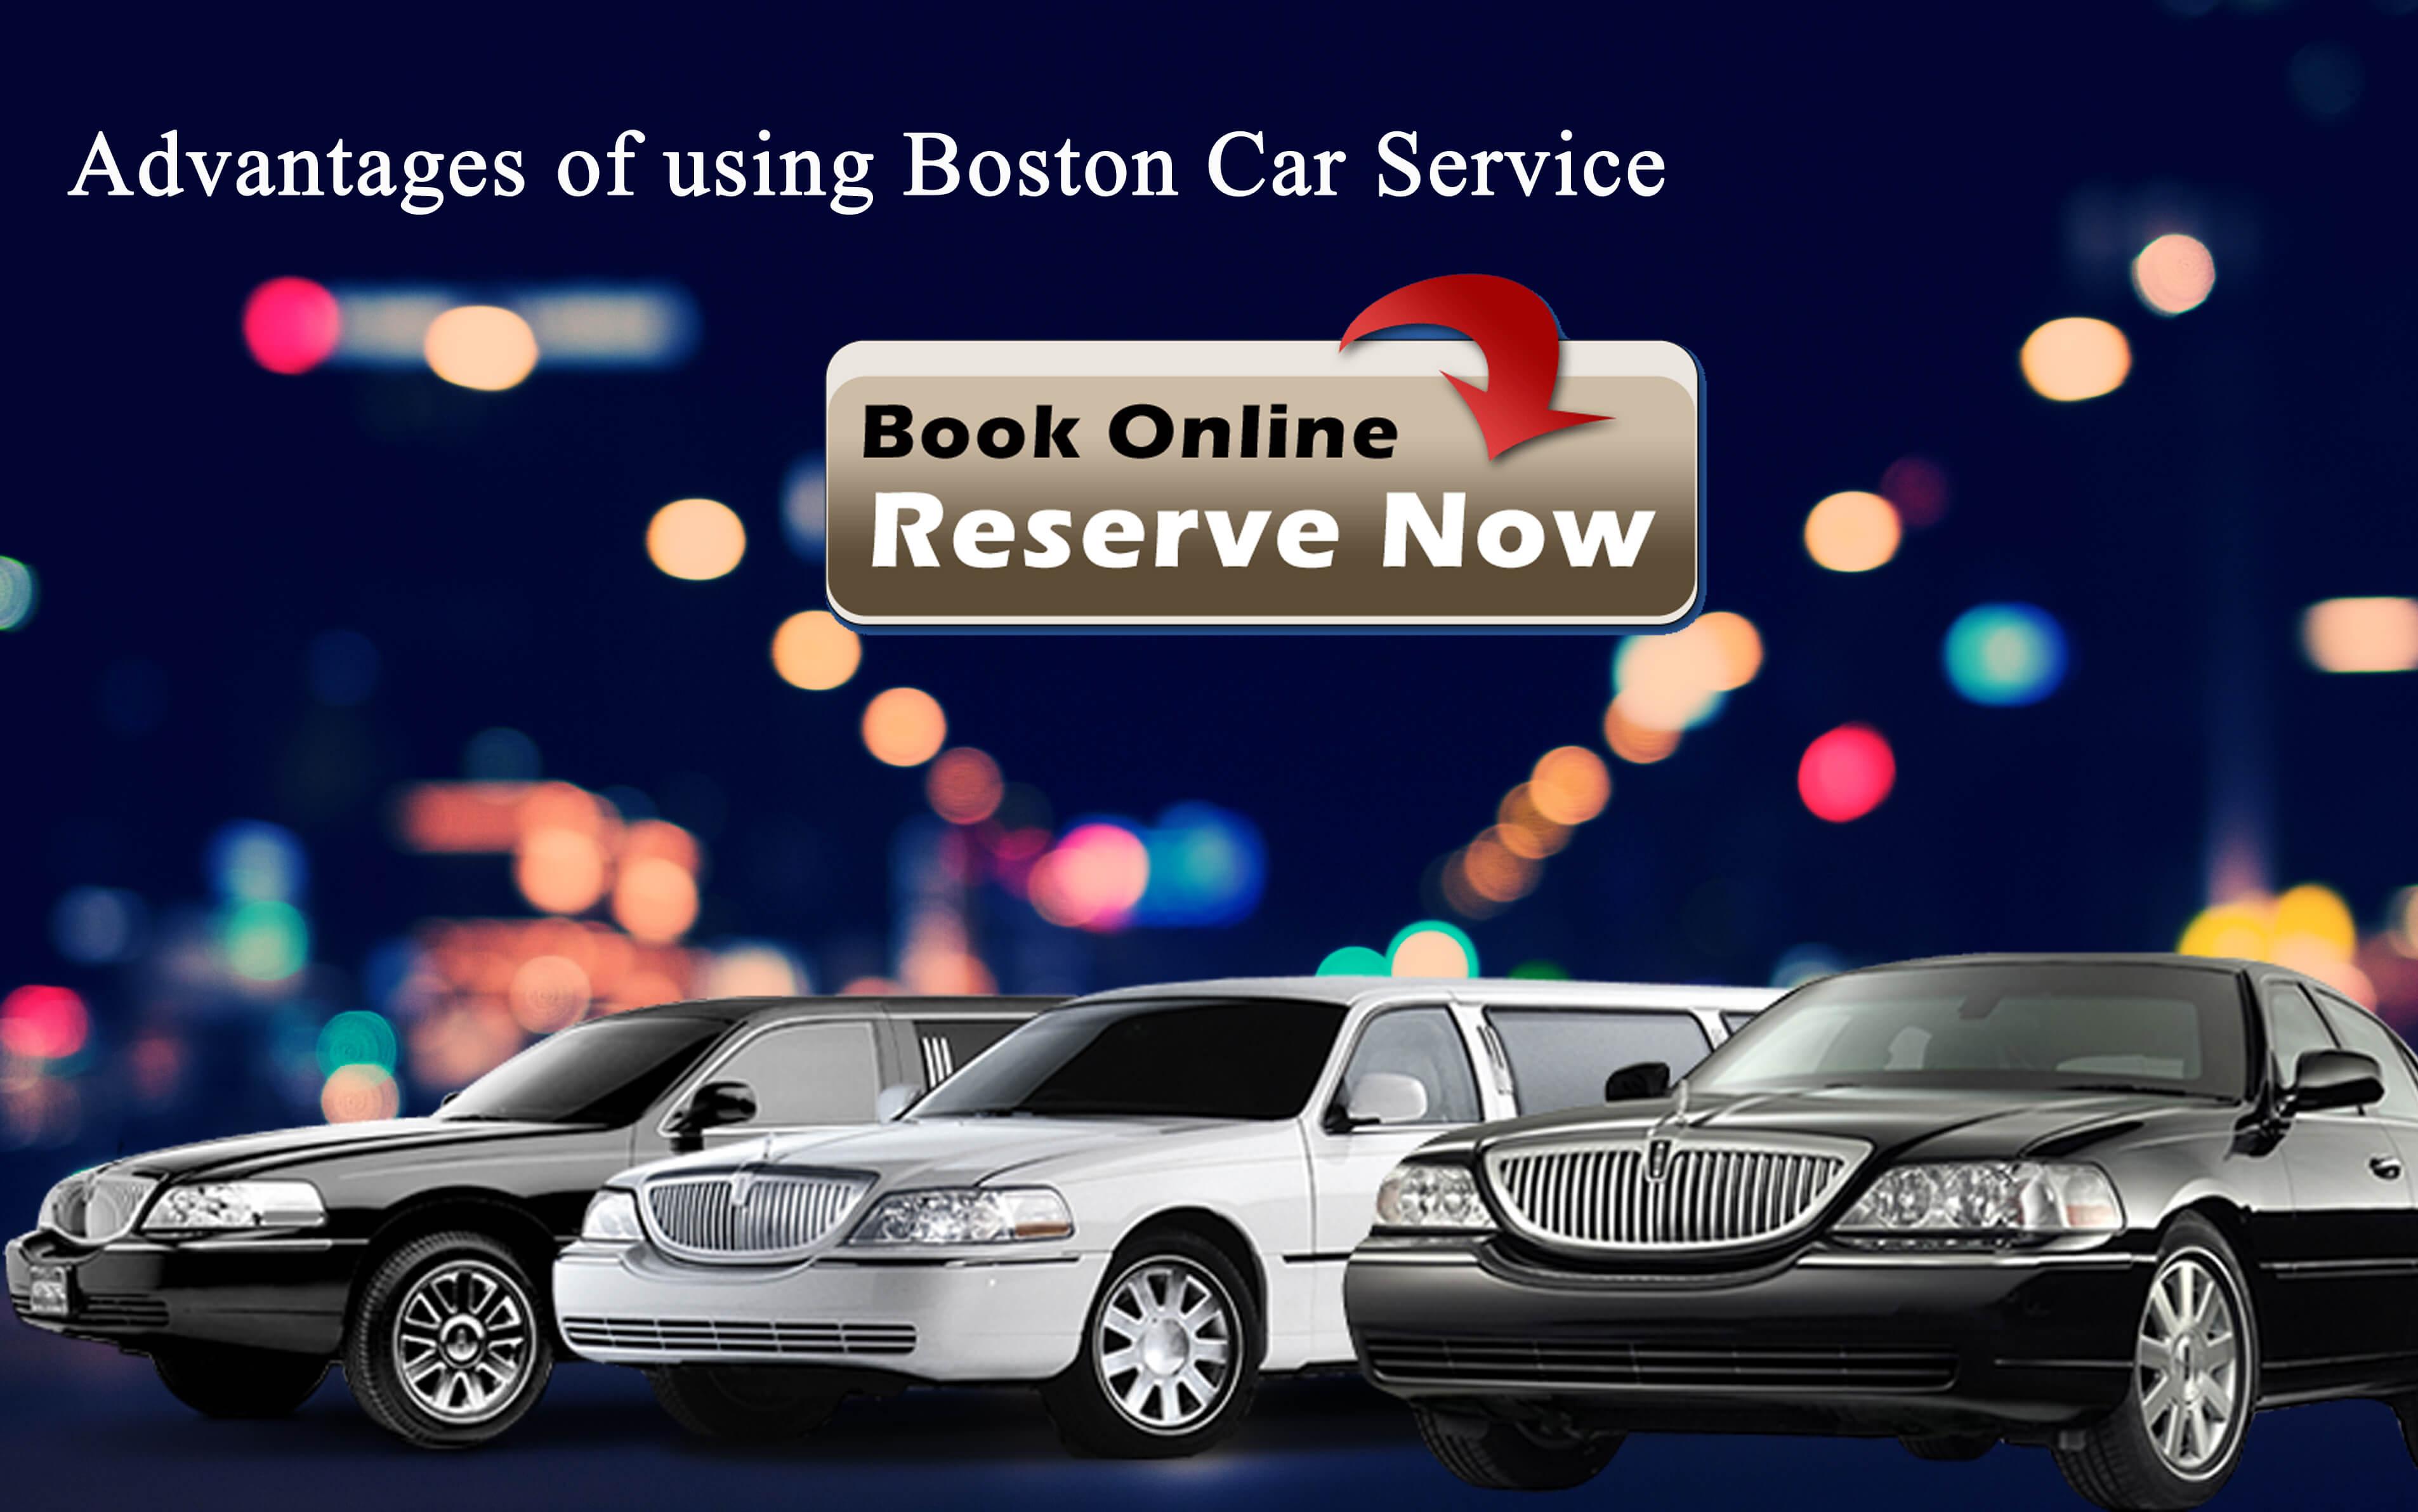 Advantages-of-using-Boston-Car-Service Advantages of using Boston Car Service